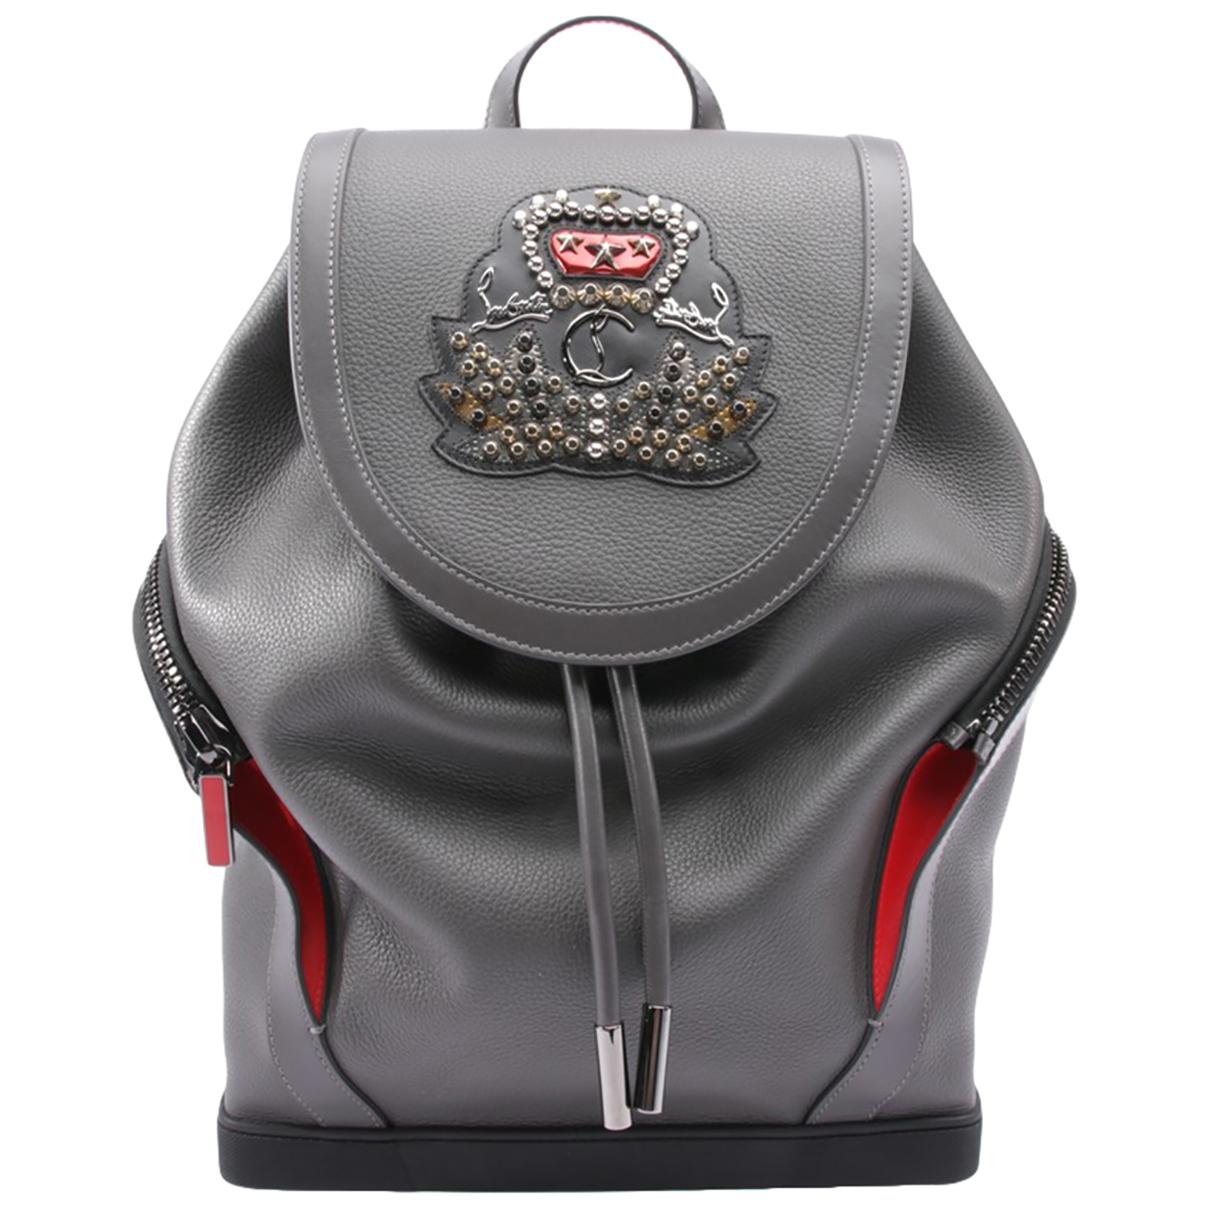 Christian Louboutin \N Black Leather backpack for Women \N